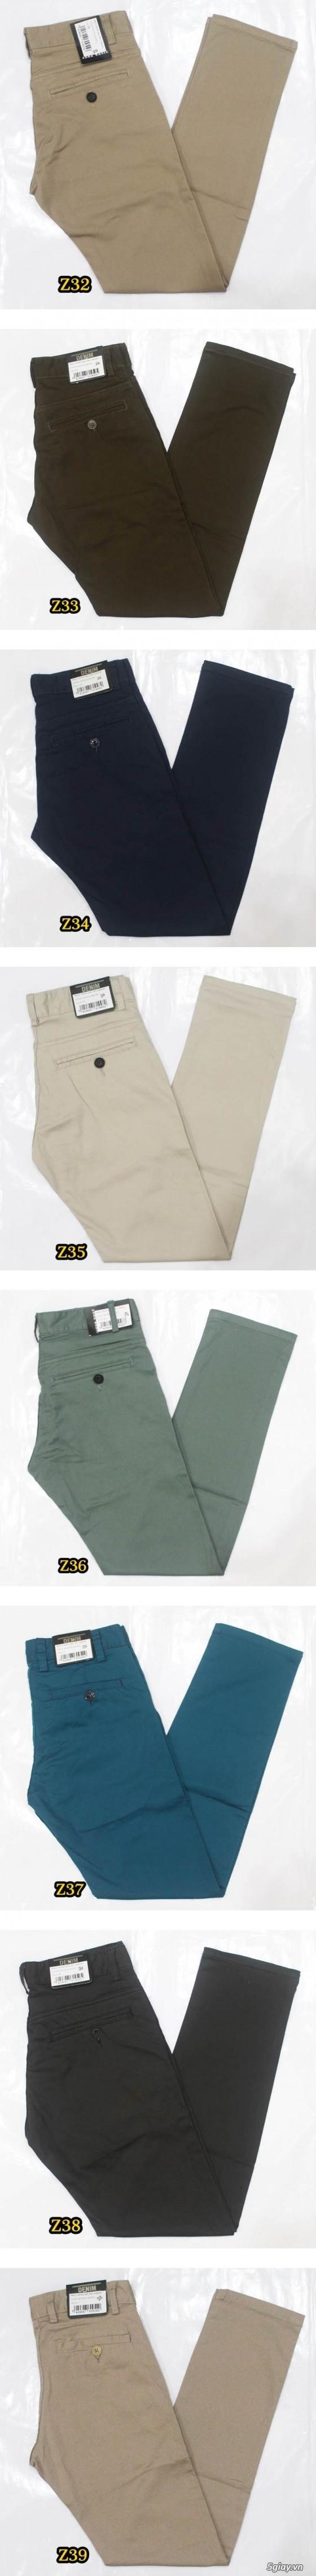 Quần kaki ZARA SlimFit,quần jean Levi's 511 SlimFit,quần short SuperDry,short jean CK - 43